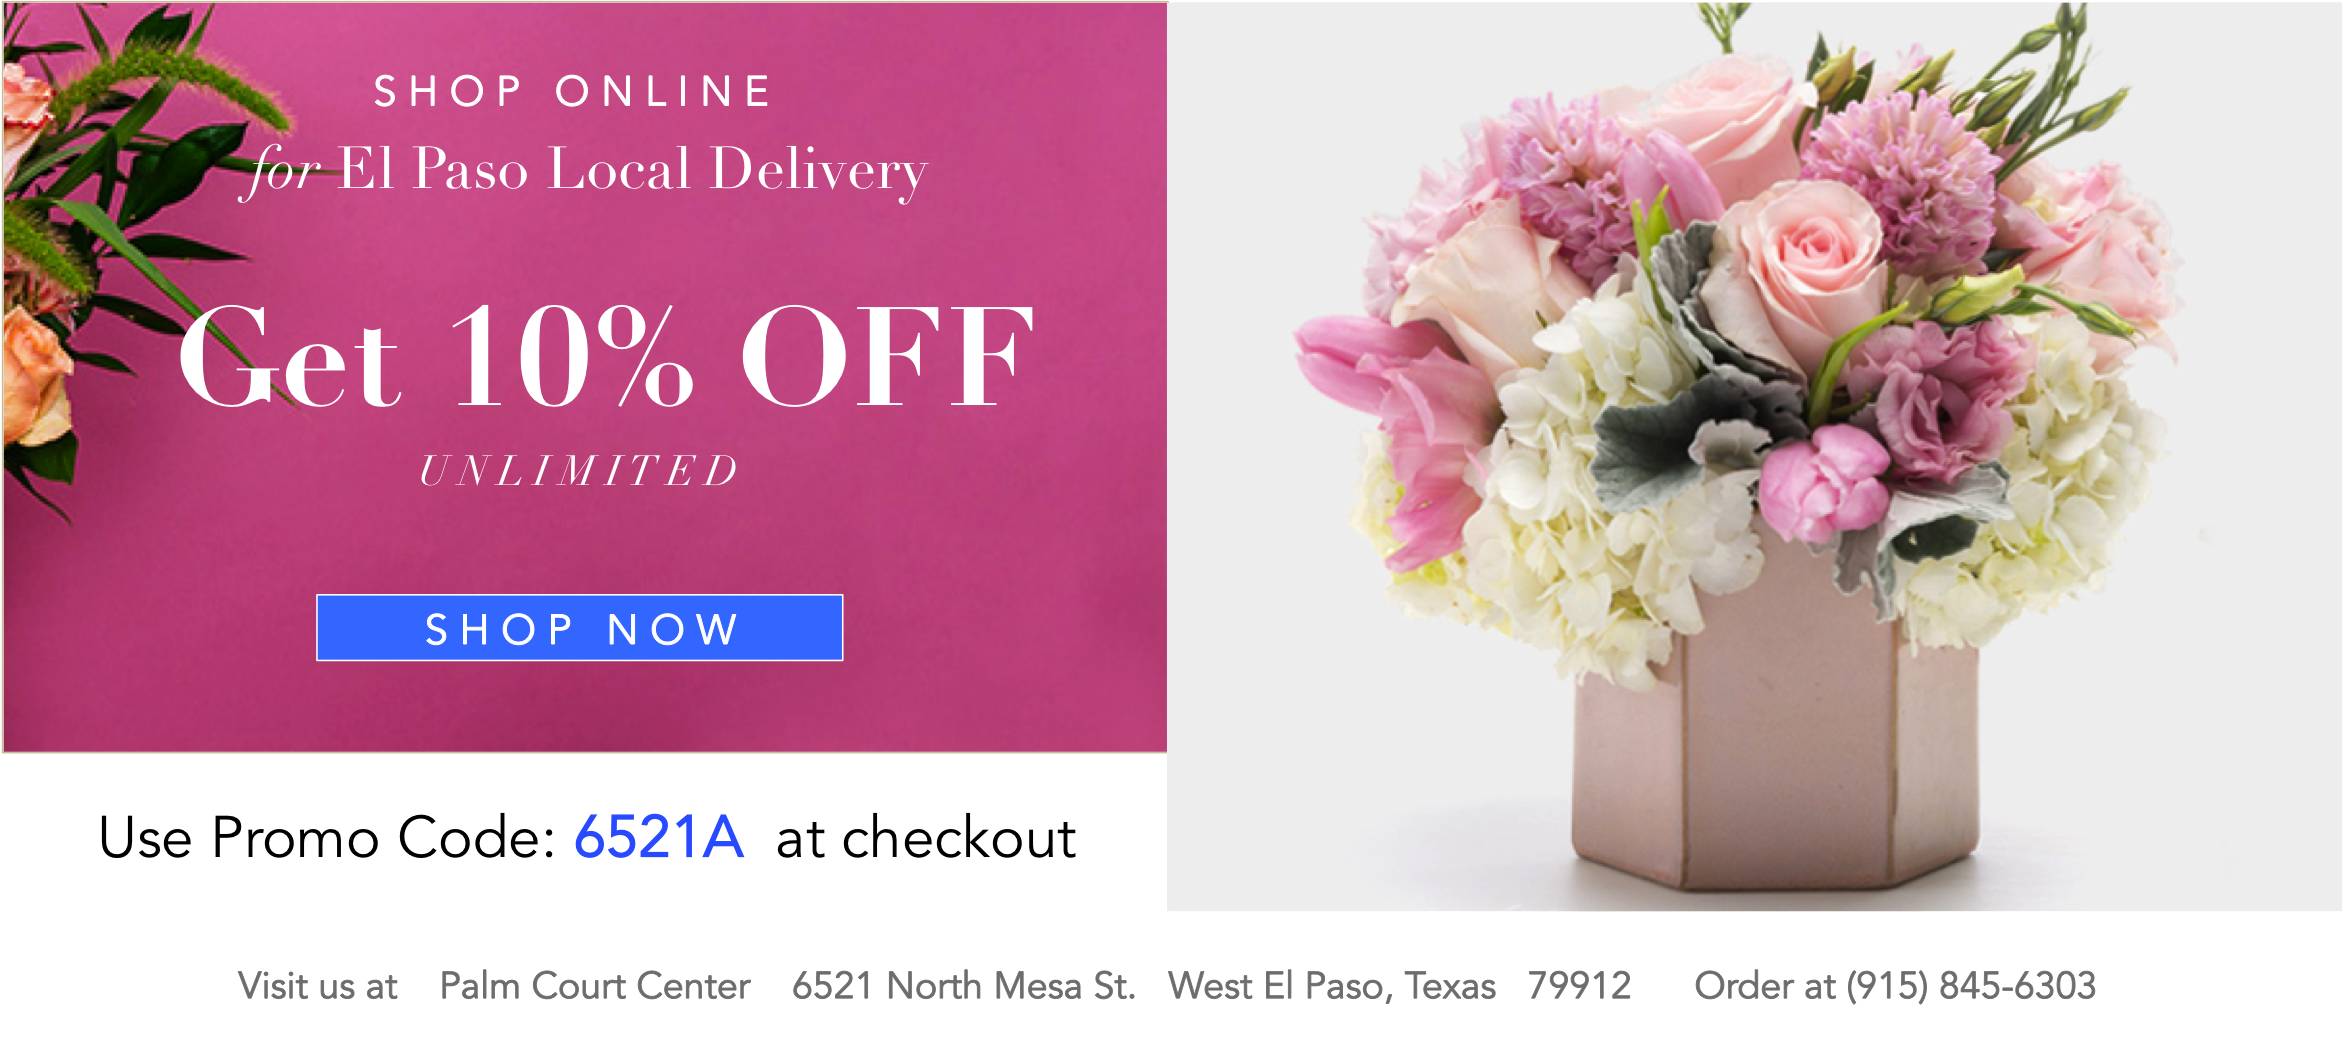 12aangies-floral-designs-el-paso-florist-79912-el-paso-texas-angies-flowers-el-paso-flowershop-el-paso-flowerdelivery-elegant-flowers-79912-westside-weddings-events-rentals-bodas-flores.png